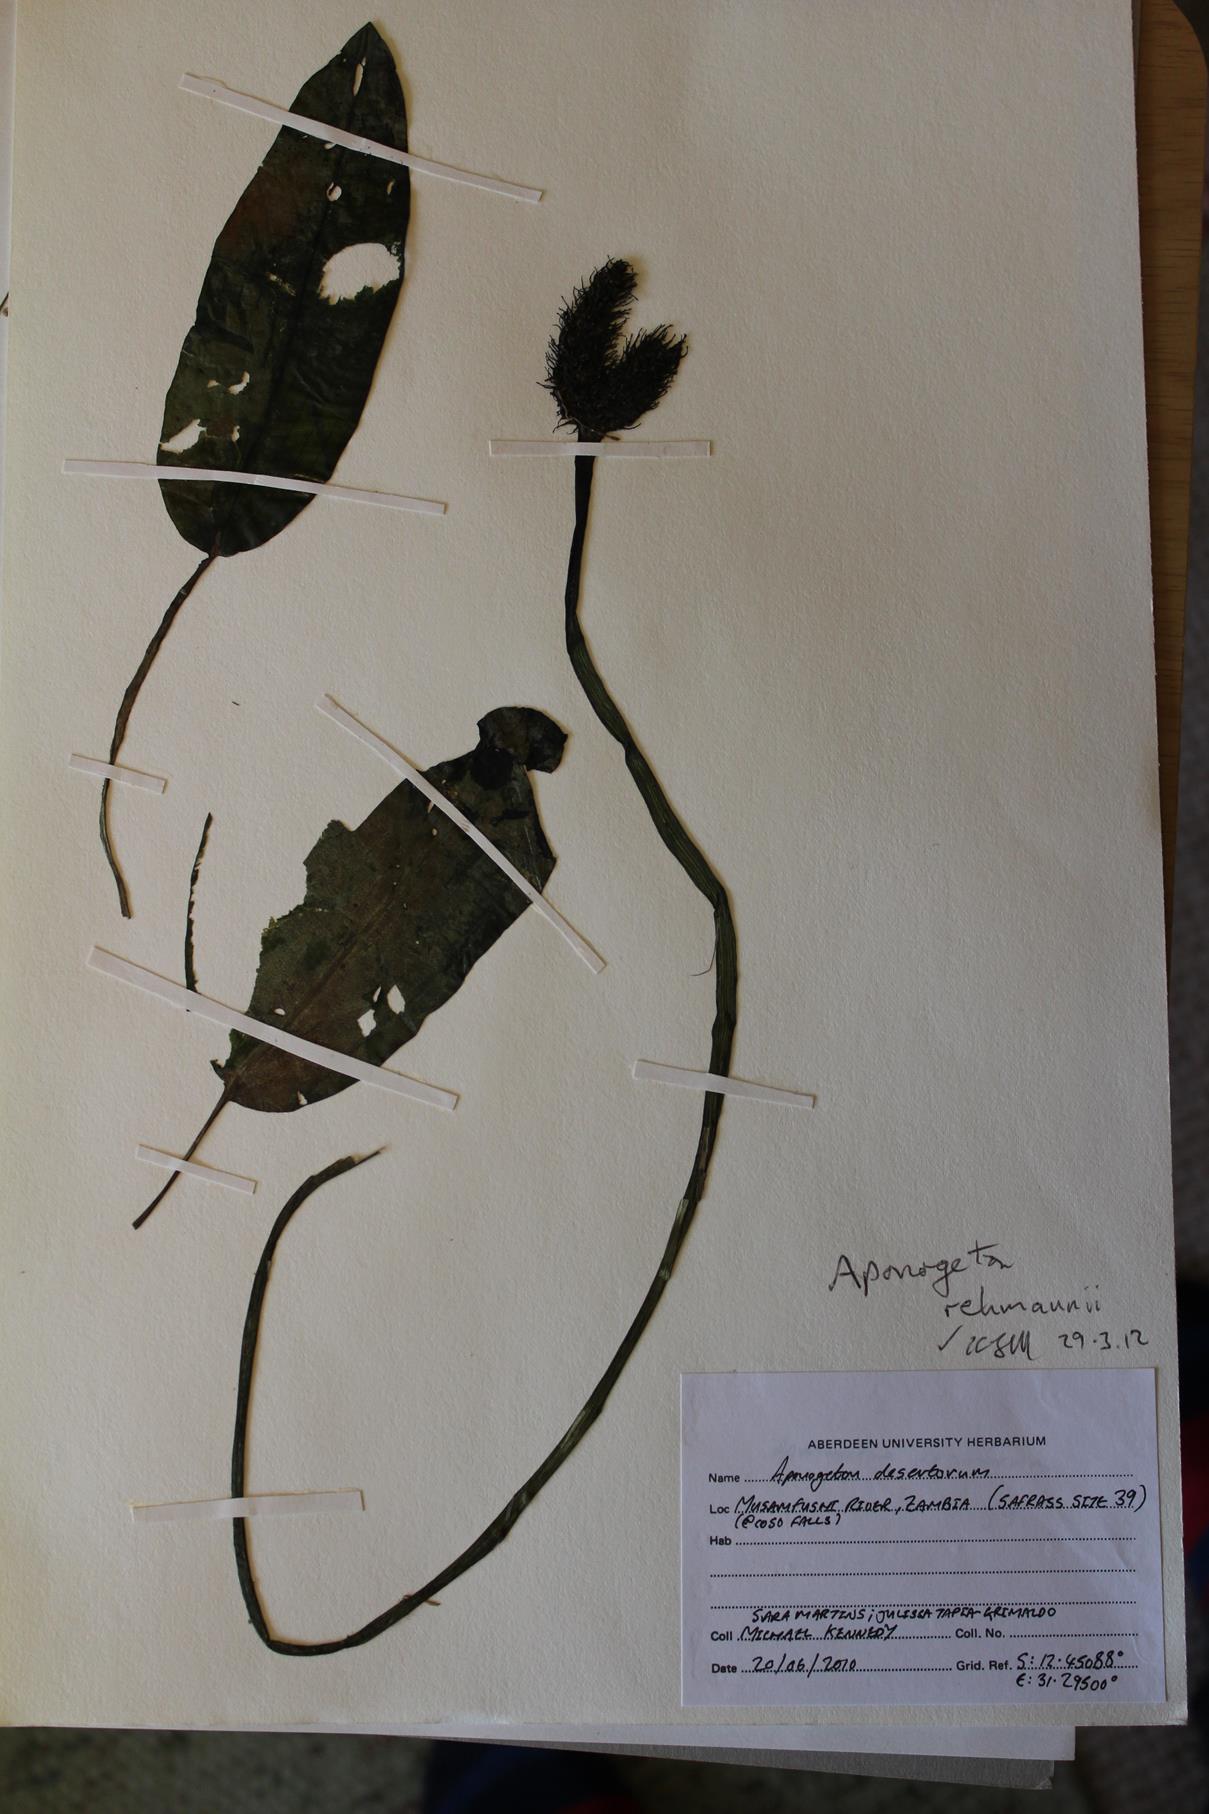 Aponogeton rehmannii